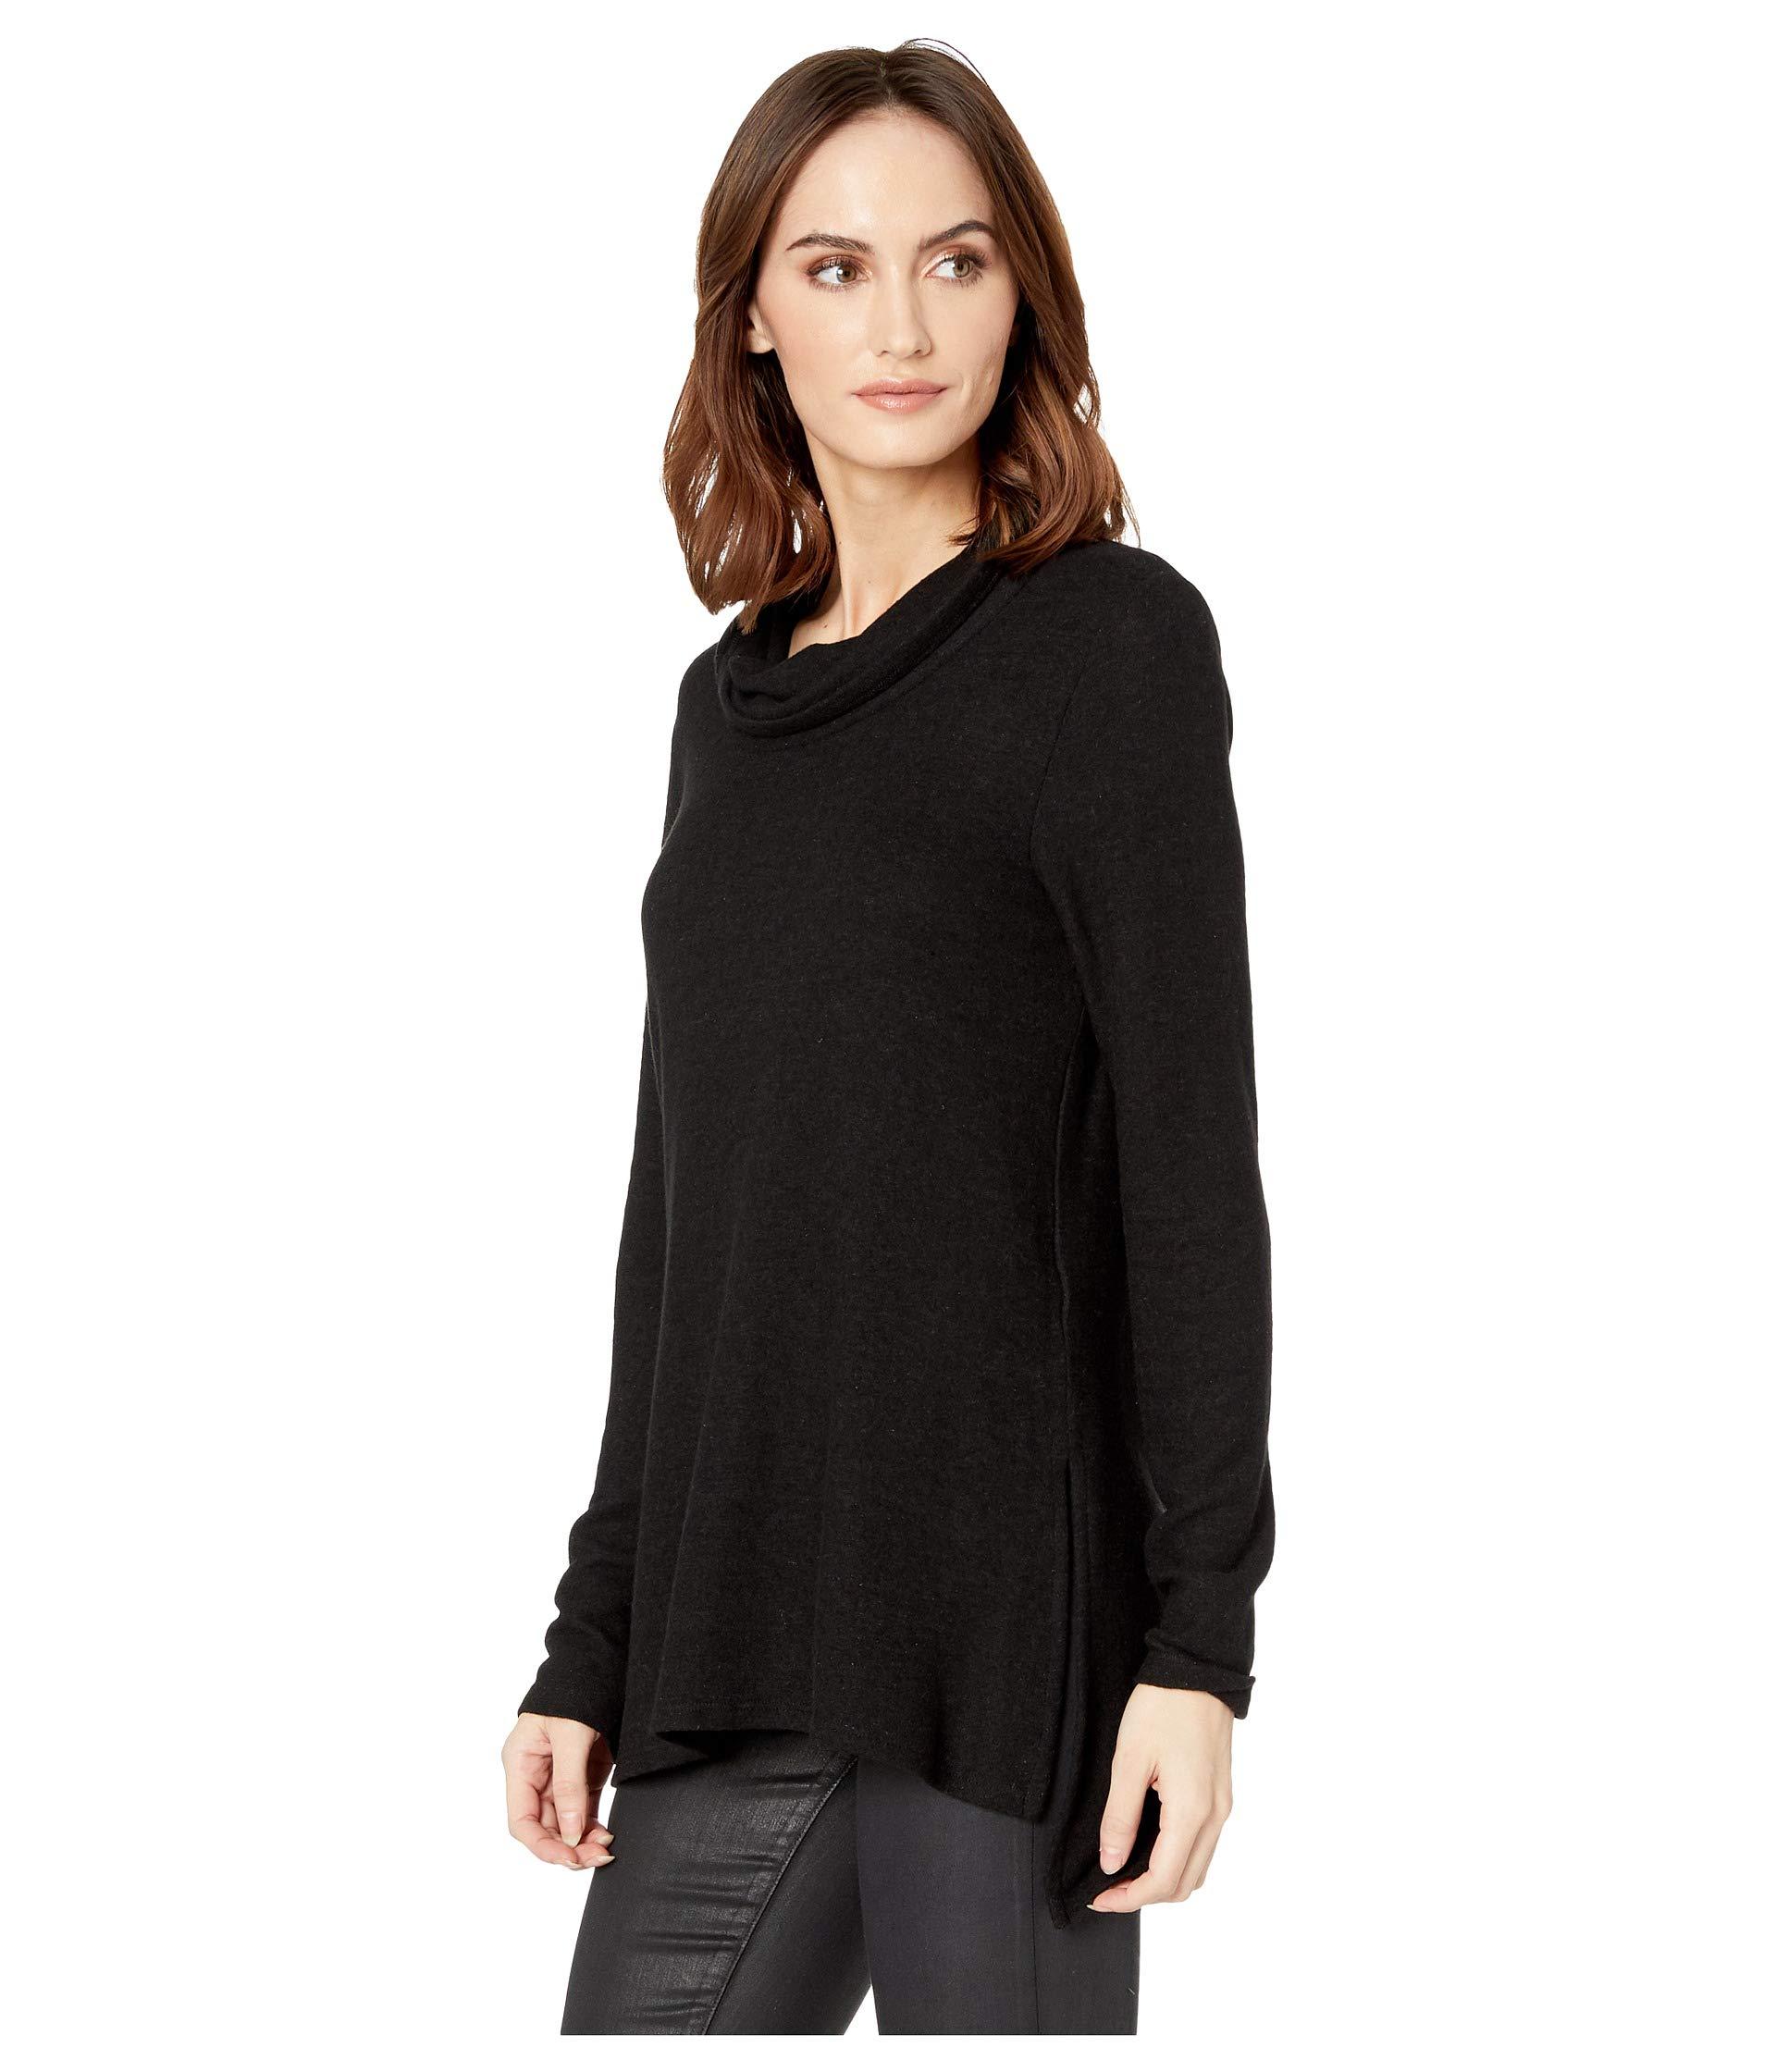 Karen Sweater Cowl Neck Kane Black HrAqHf6x